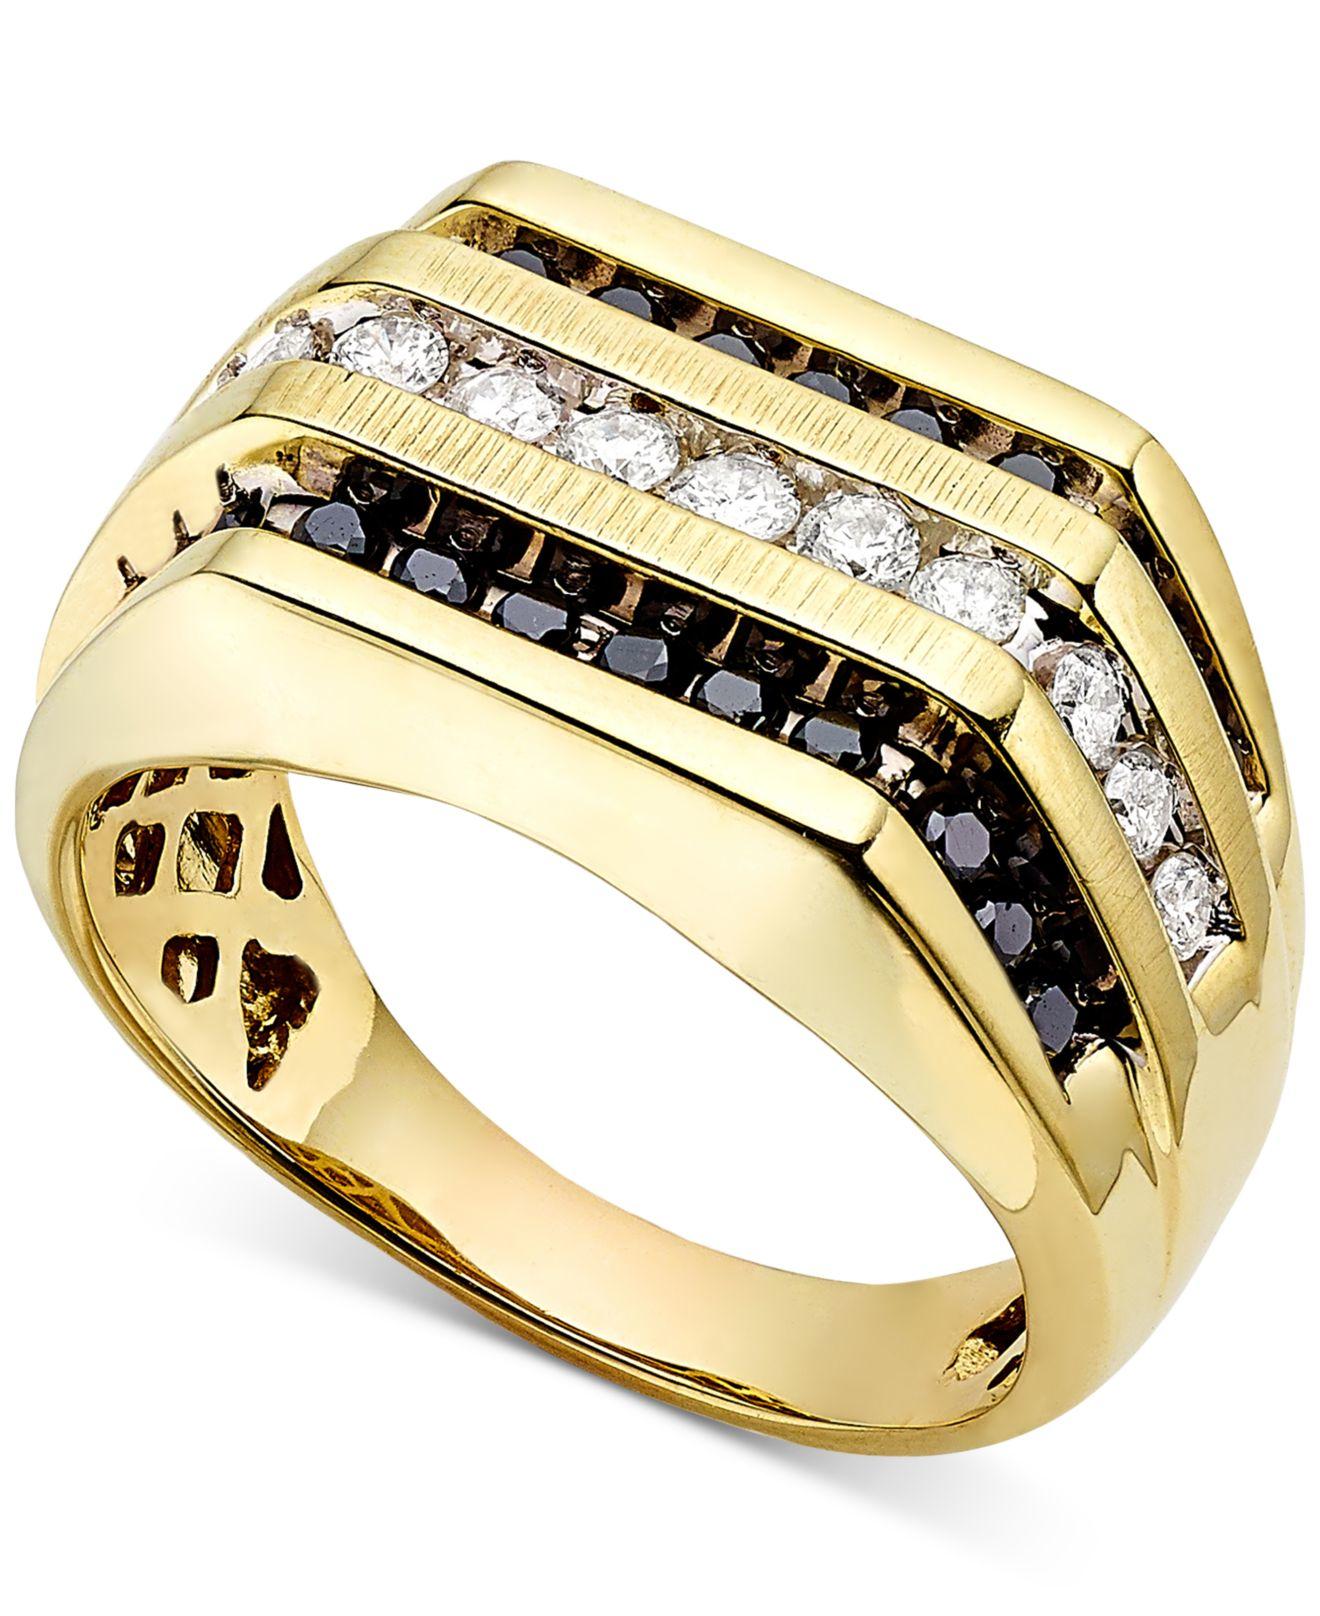 Macys Mens Wedding Rings: Macy's Men's White And Black Diamond (1 Ct. T.w.) Ring In